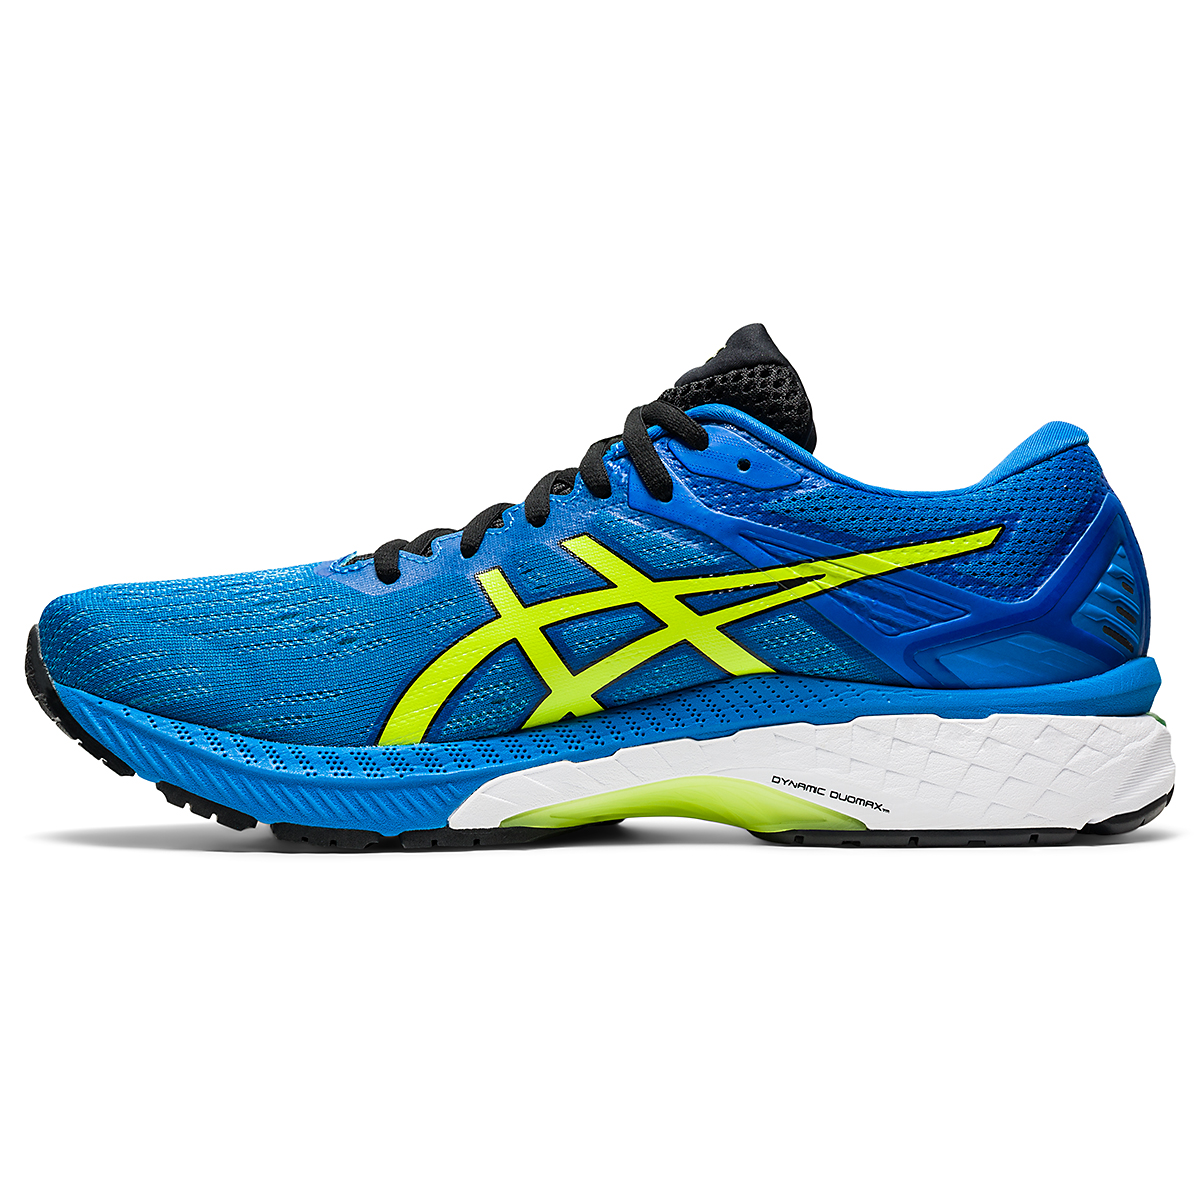 Men's Asics Gt-2000 9 Running Shoe - Color: Directoire Blue - Size: 7 - Width: Regular, Directoire Blue, large, image 2